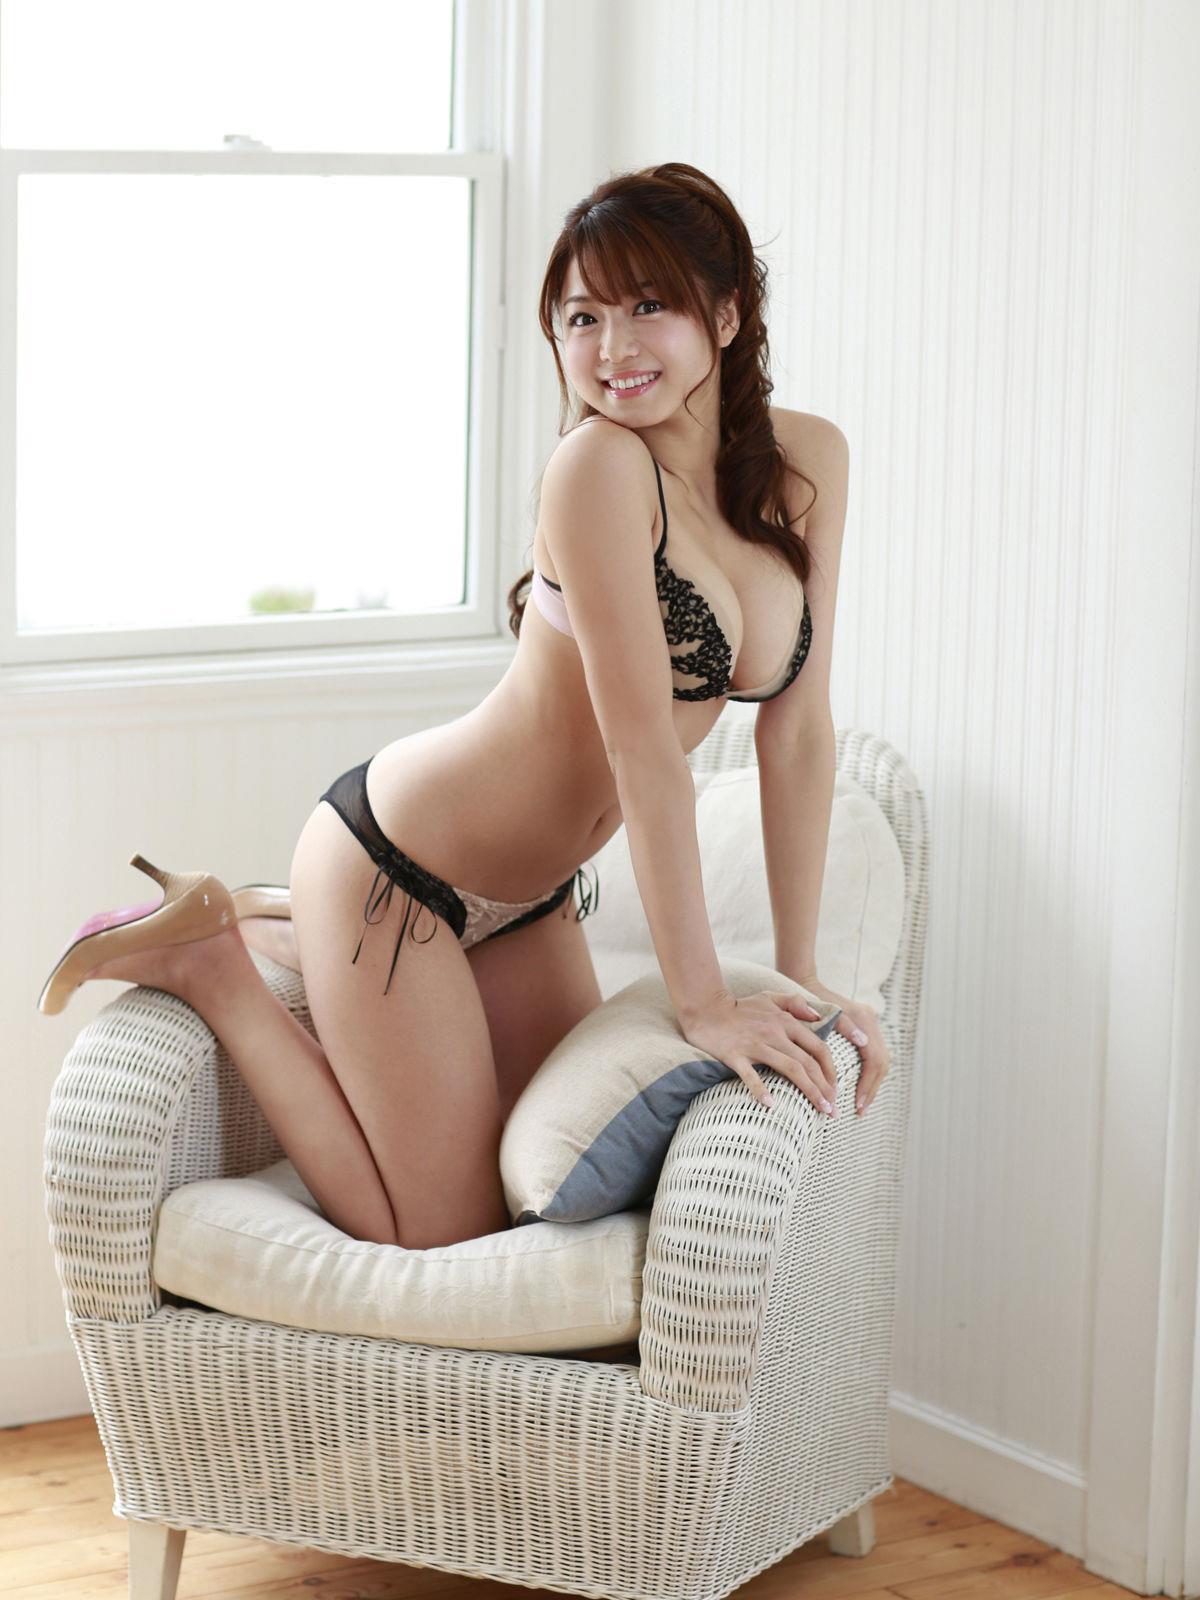 中村静香 画像 46